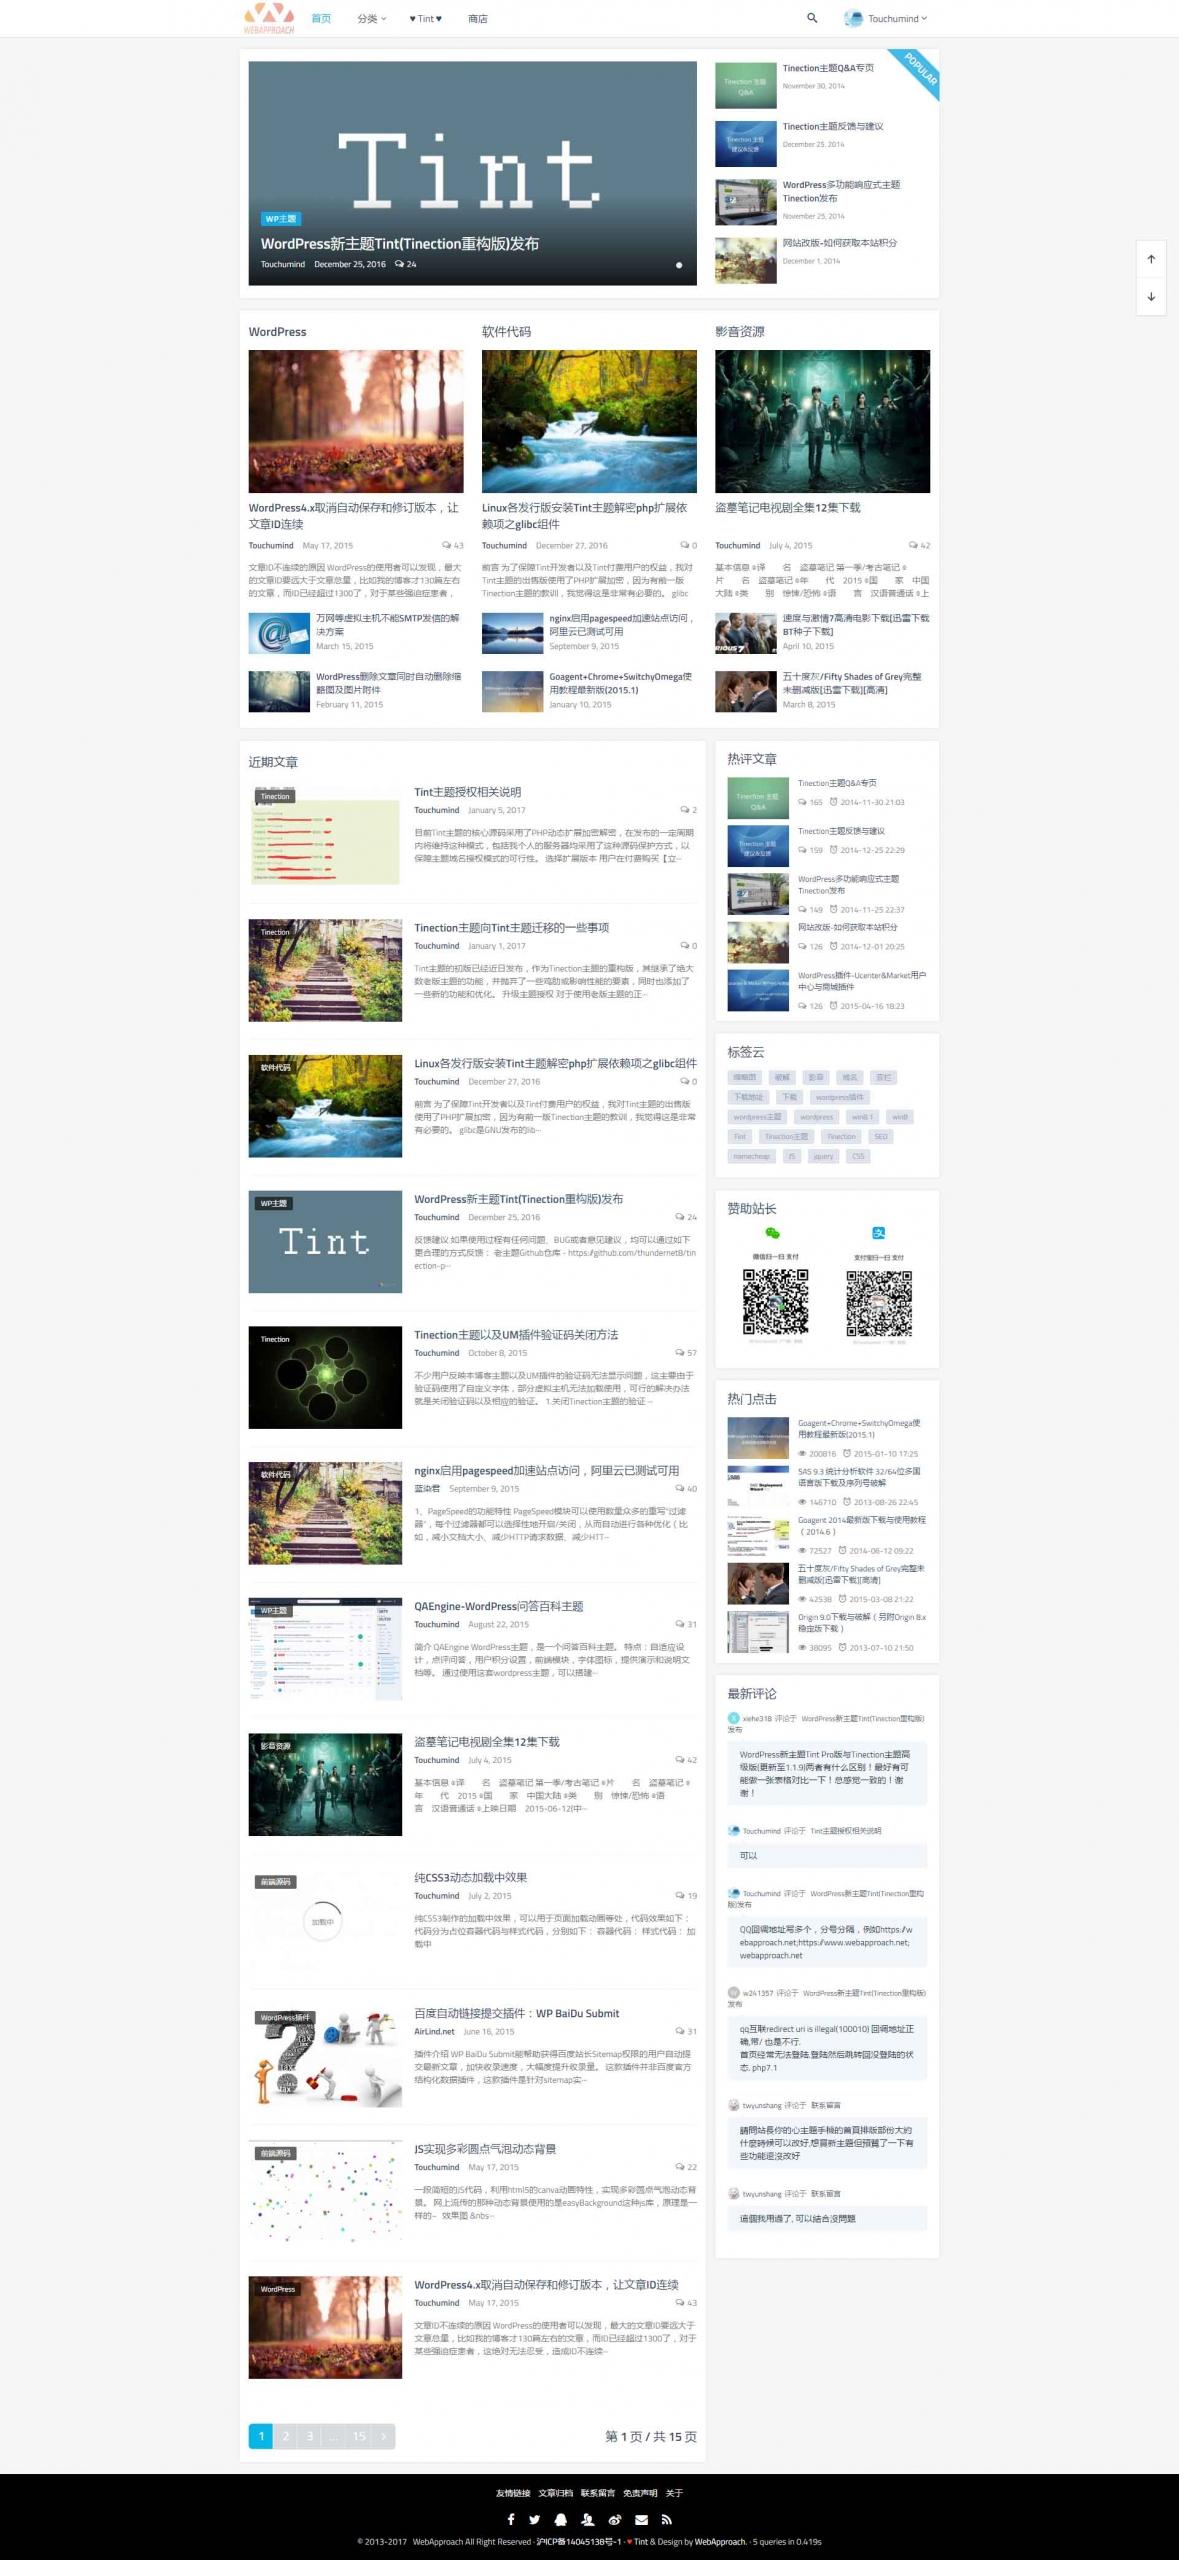 WordPress主题 TinT Pro高级版主题2.0.6破解版